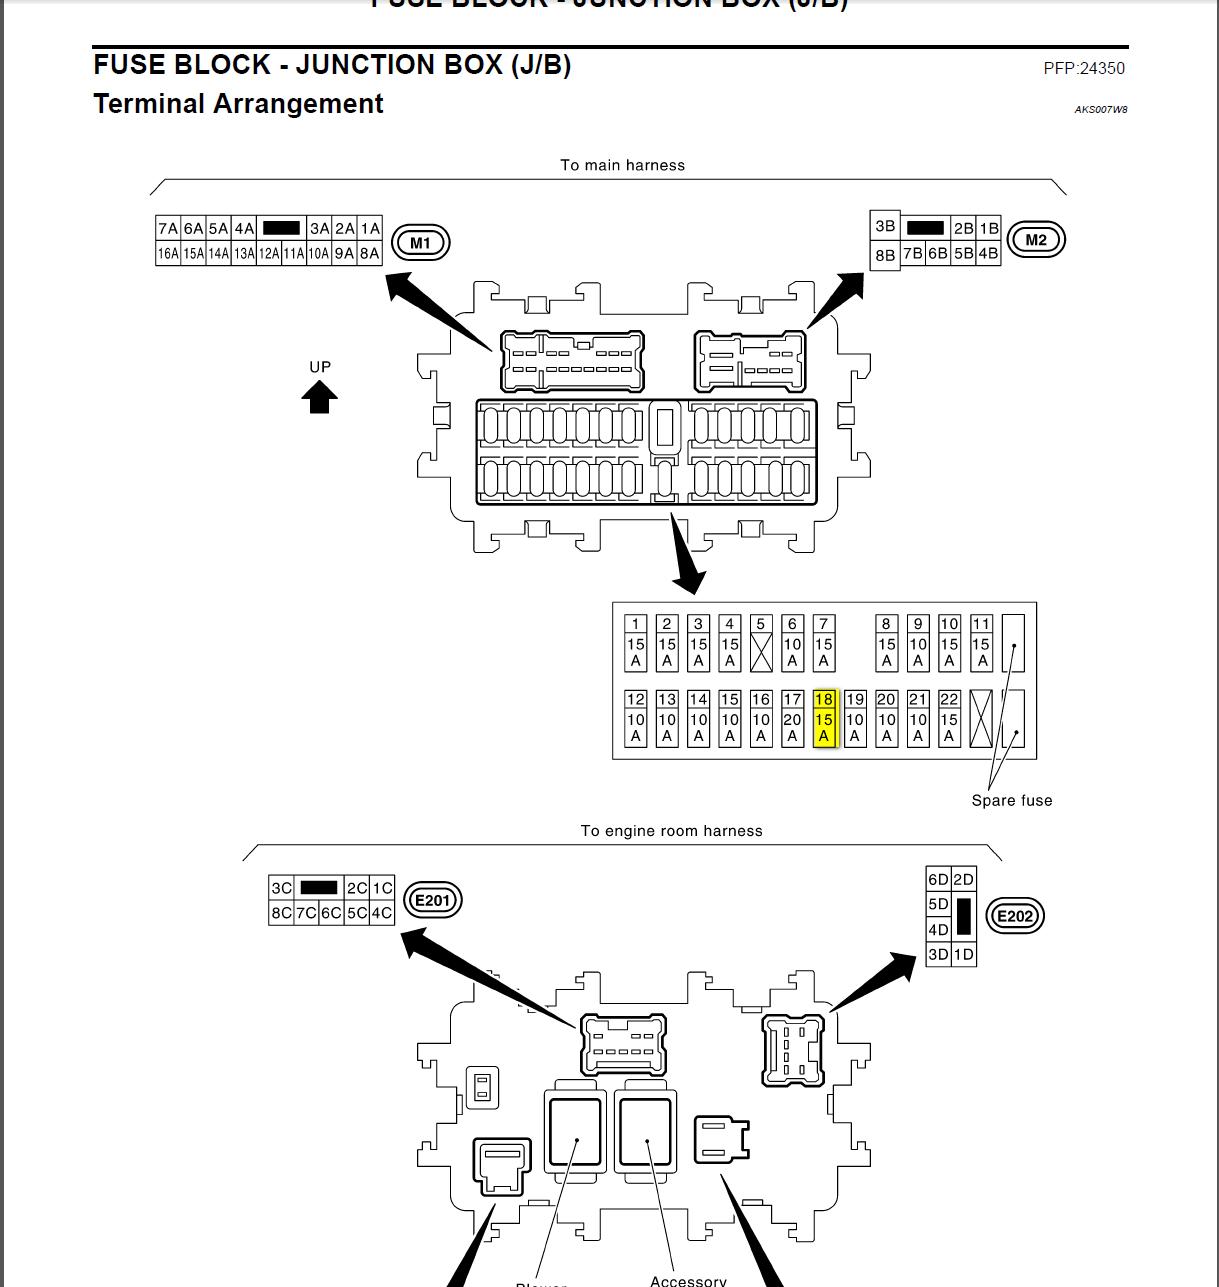 [SODI_2457]   NG_1057] Infiniti Fx35 Fuse Box Diagram On Infiniti G35 Lock Actuator Diagram  Wiring Diagram | Infiniti Fx35 Radio Wiring Diagram |  | Hroni Inst Meric Brece Weasi Emba Mohammedshrine Librar Wiring 101